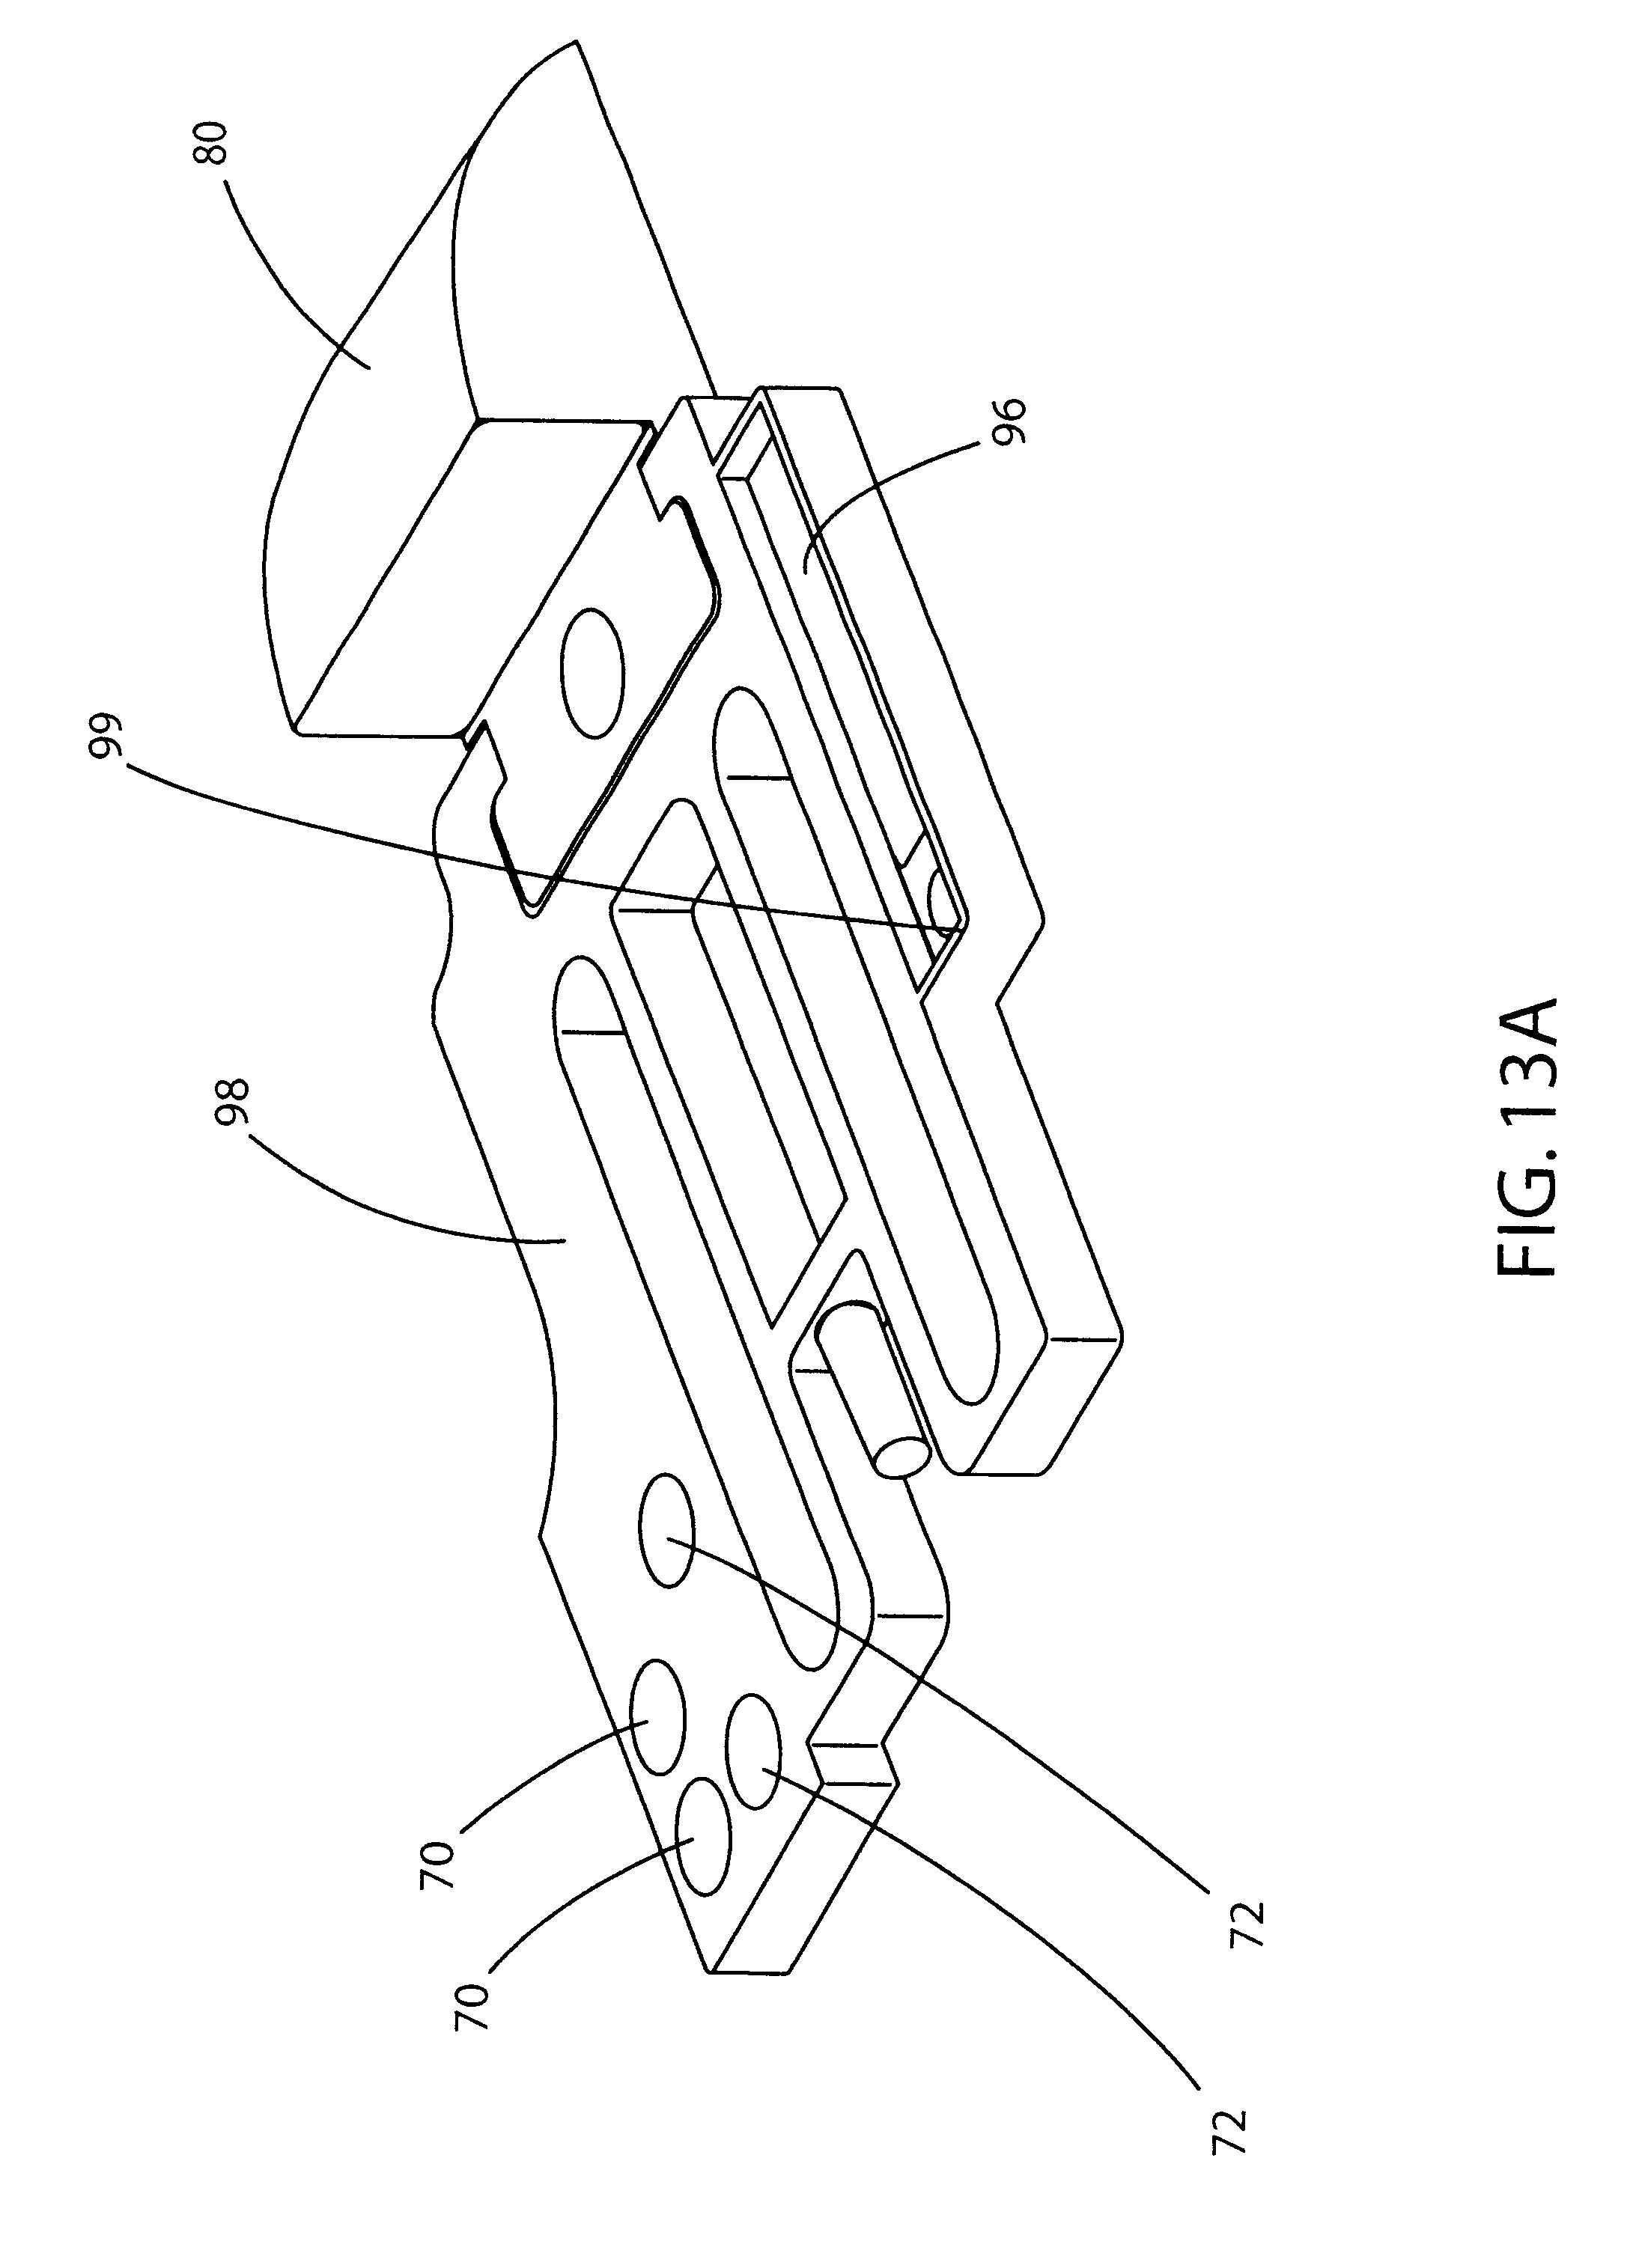 keypad combination lock auto electrical wiring diagram1995 Jeep Cherokee Fuse Diagram Http Wwwjustanswercom Jeep 2p88t #21